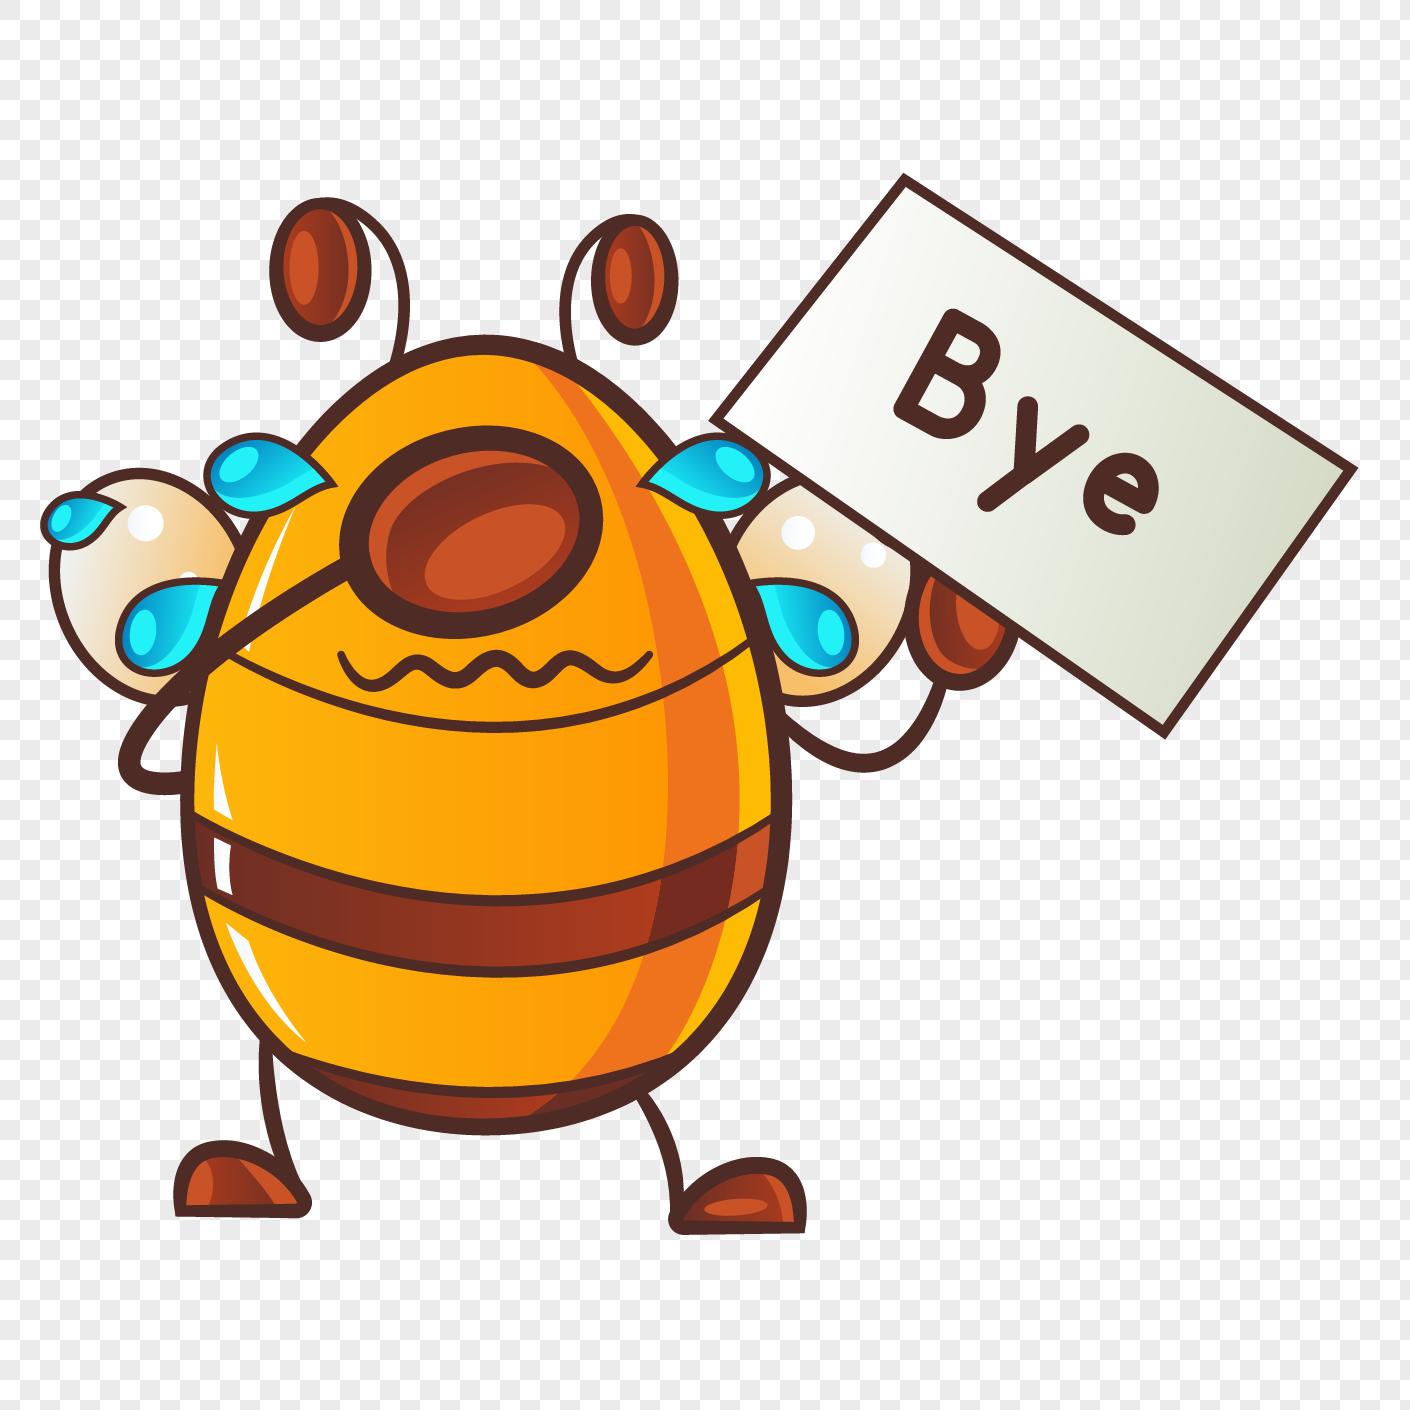 Clipart Bee Imej Kartun Lebah Lucu Wwwtollebildcom